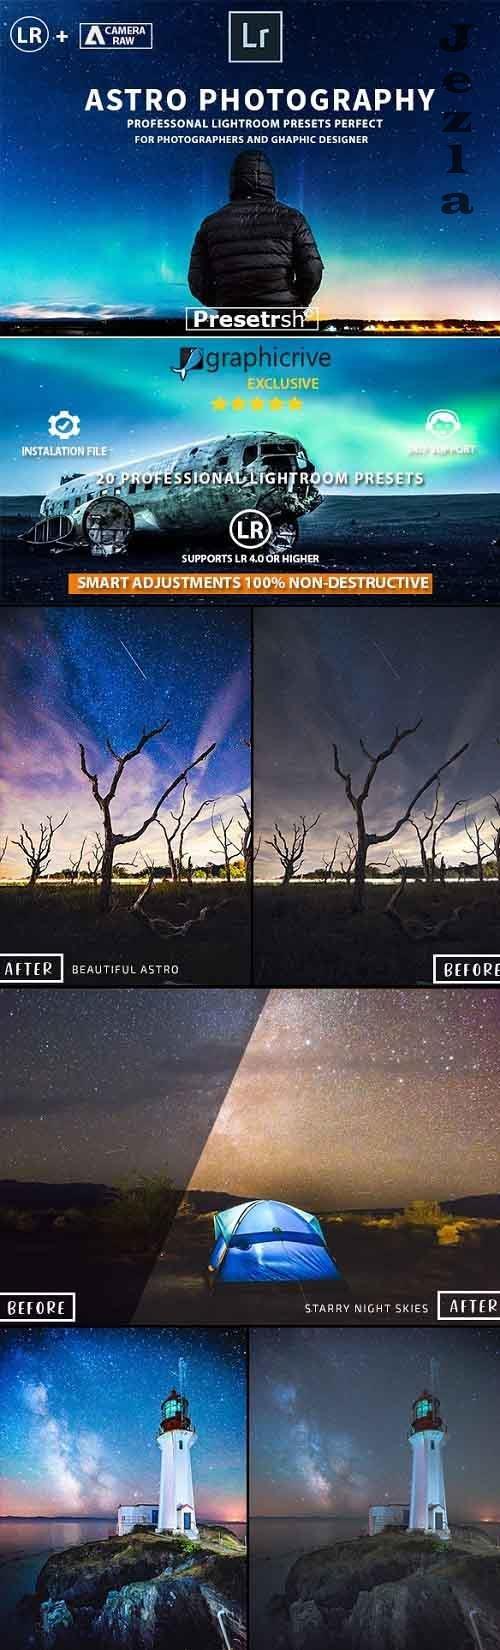 20 Pro Astrophotography Lightroom Presets 21421453